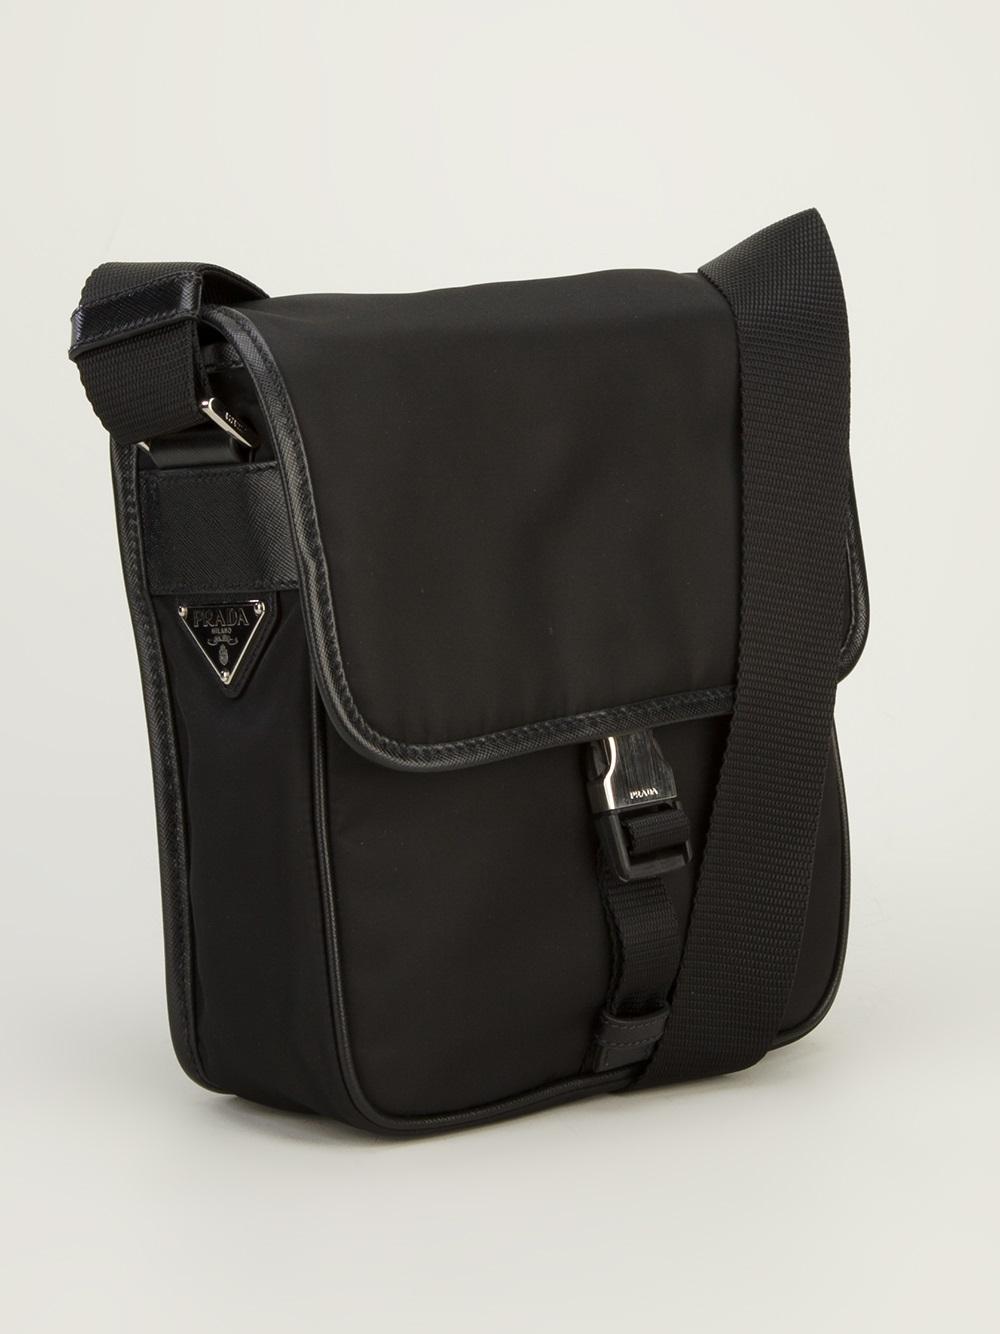 ... ireland lyst prada messenger bag in black for men 2f9dc 2166b b5b6401cd3f7c